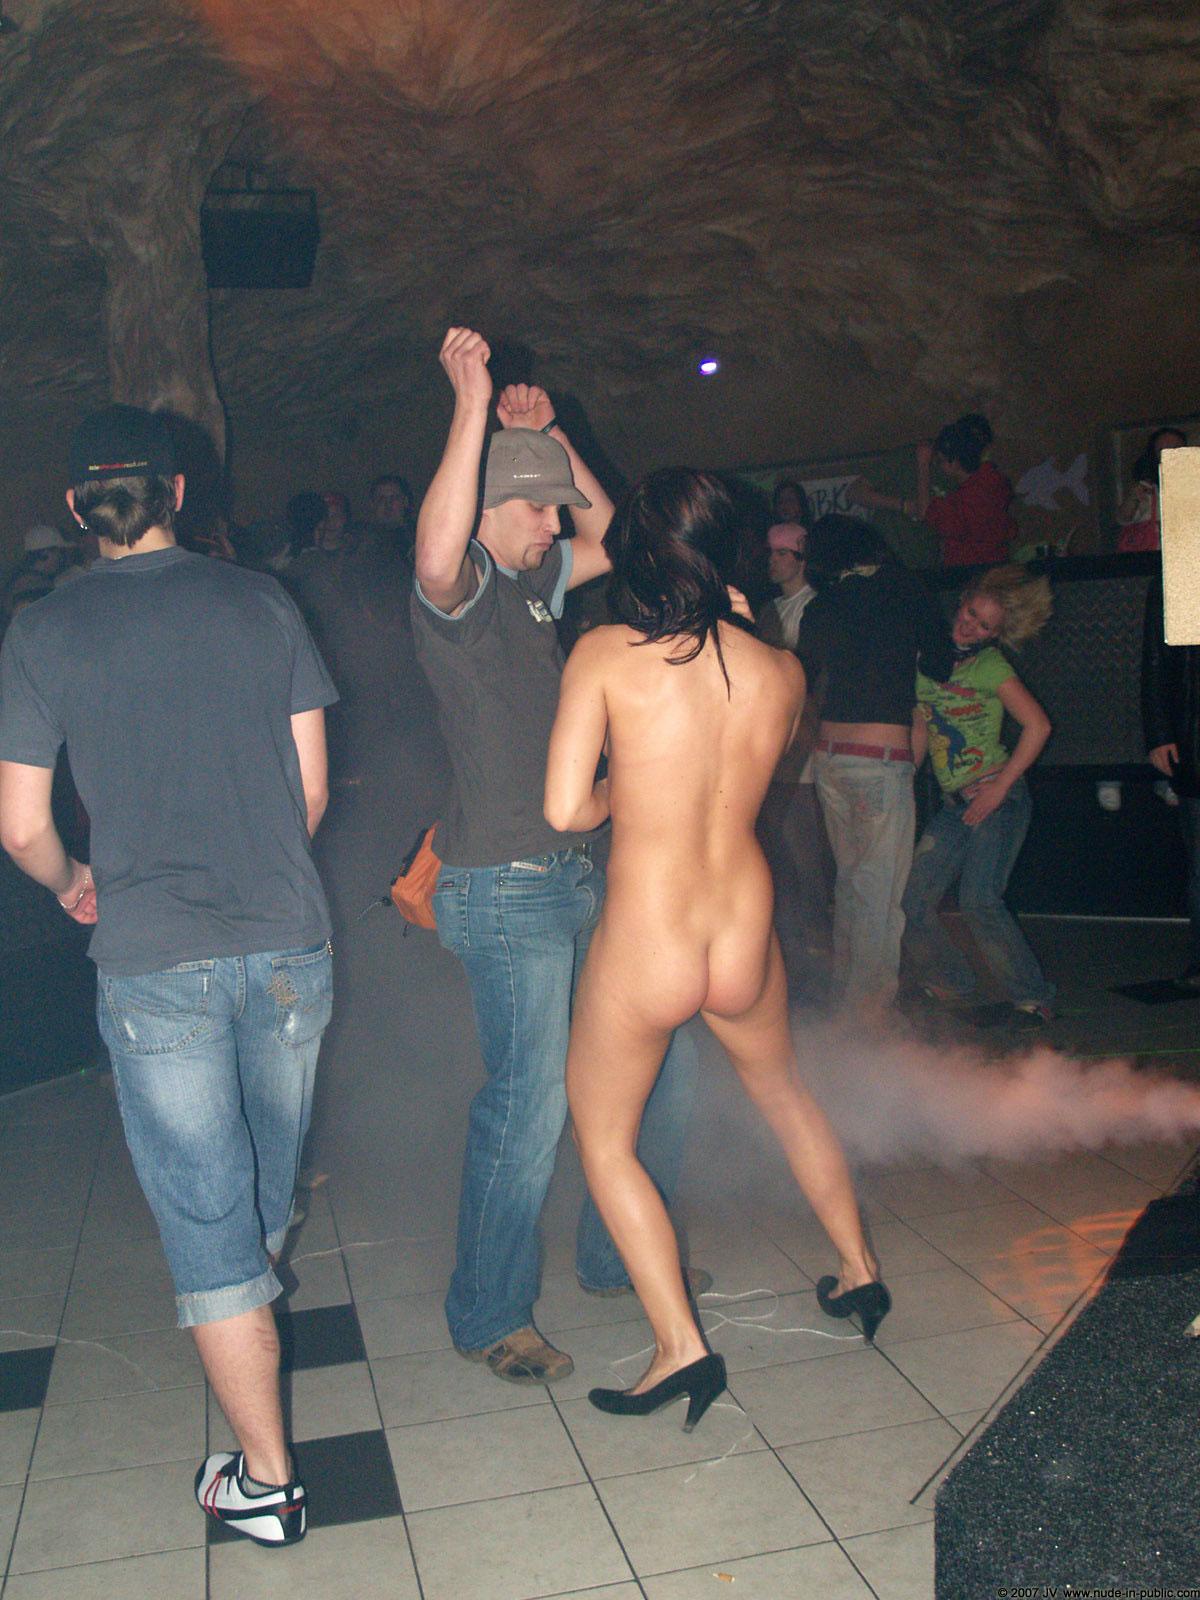 Kitkat club public nudity in germany by snahbrandy 5